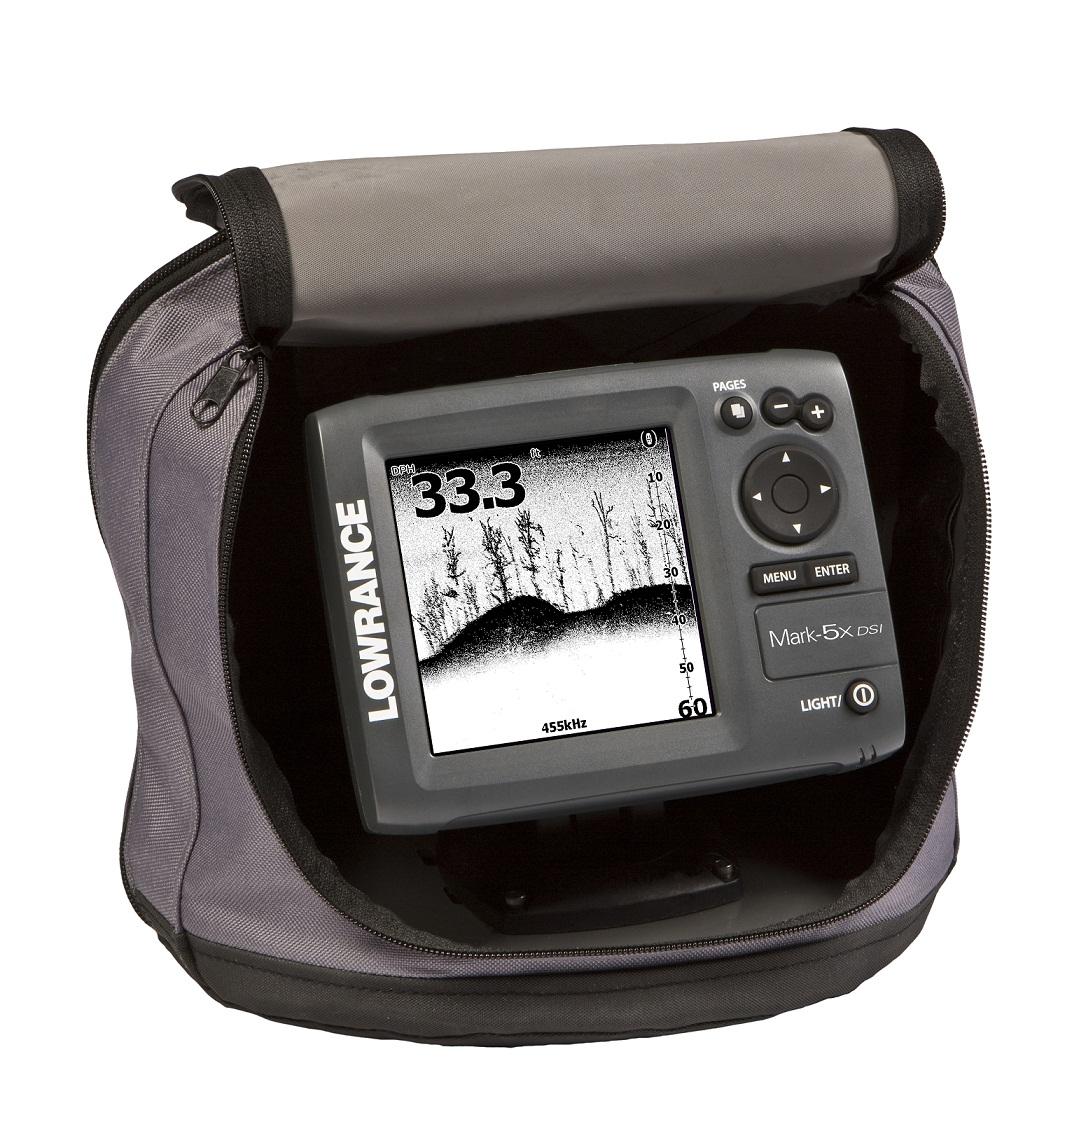 Mark 5x dsi portable fishfinder for Portable fish finder reviews